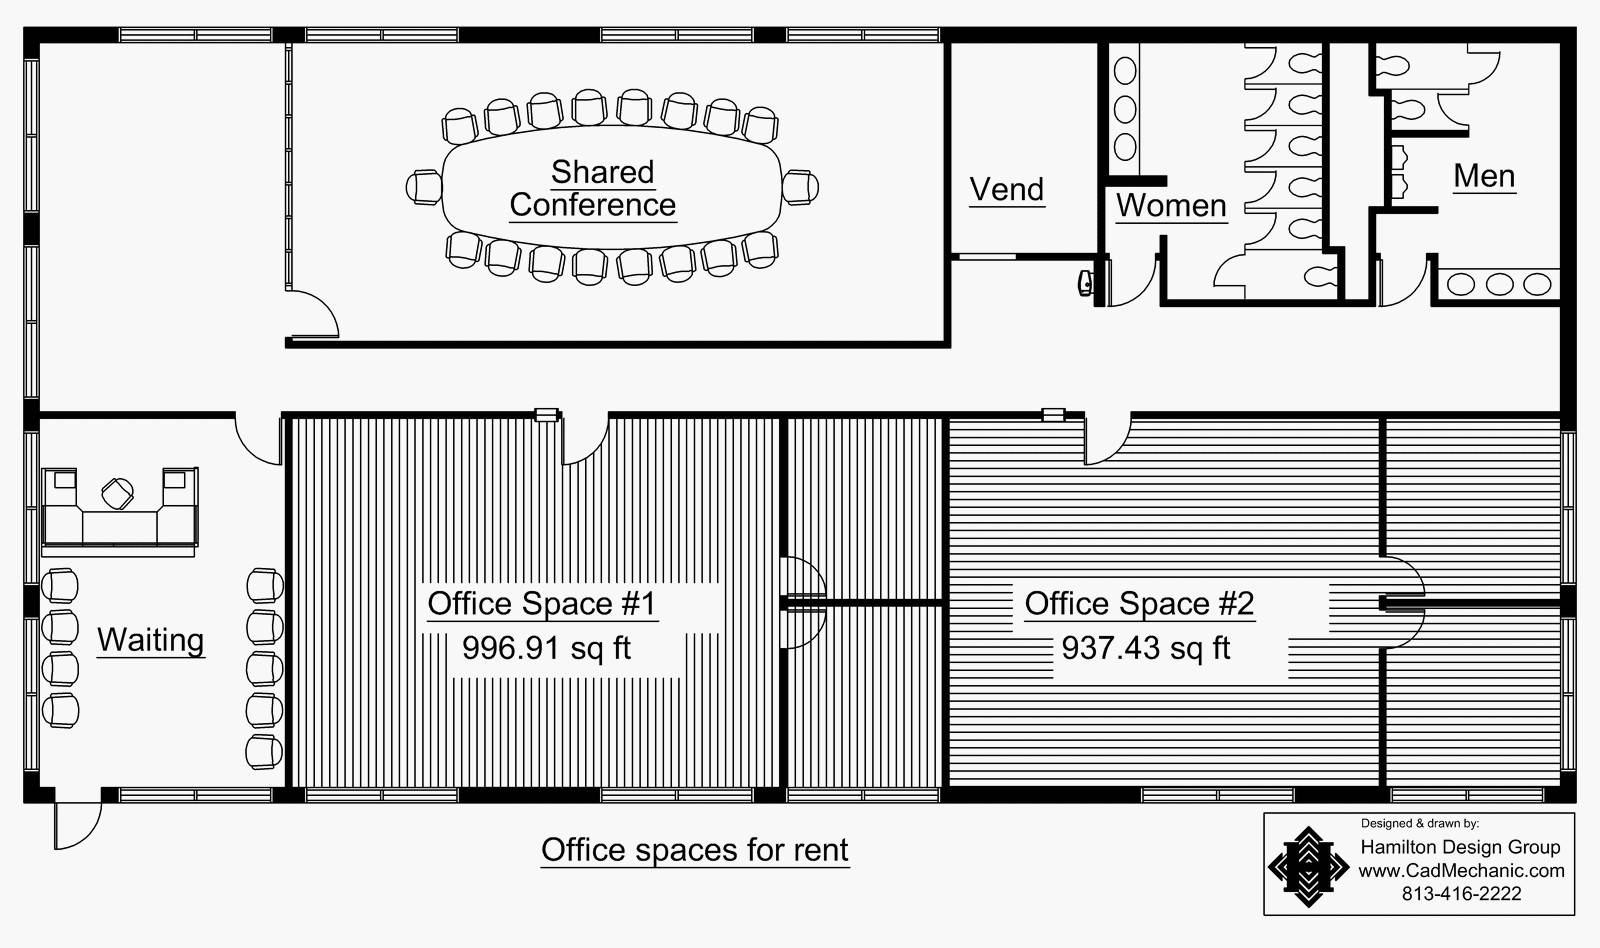 Commercial Building Floor Plan Home Plans House Plans 19539